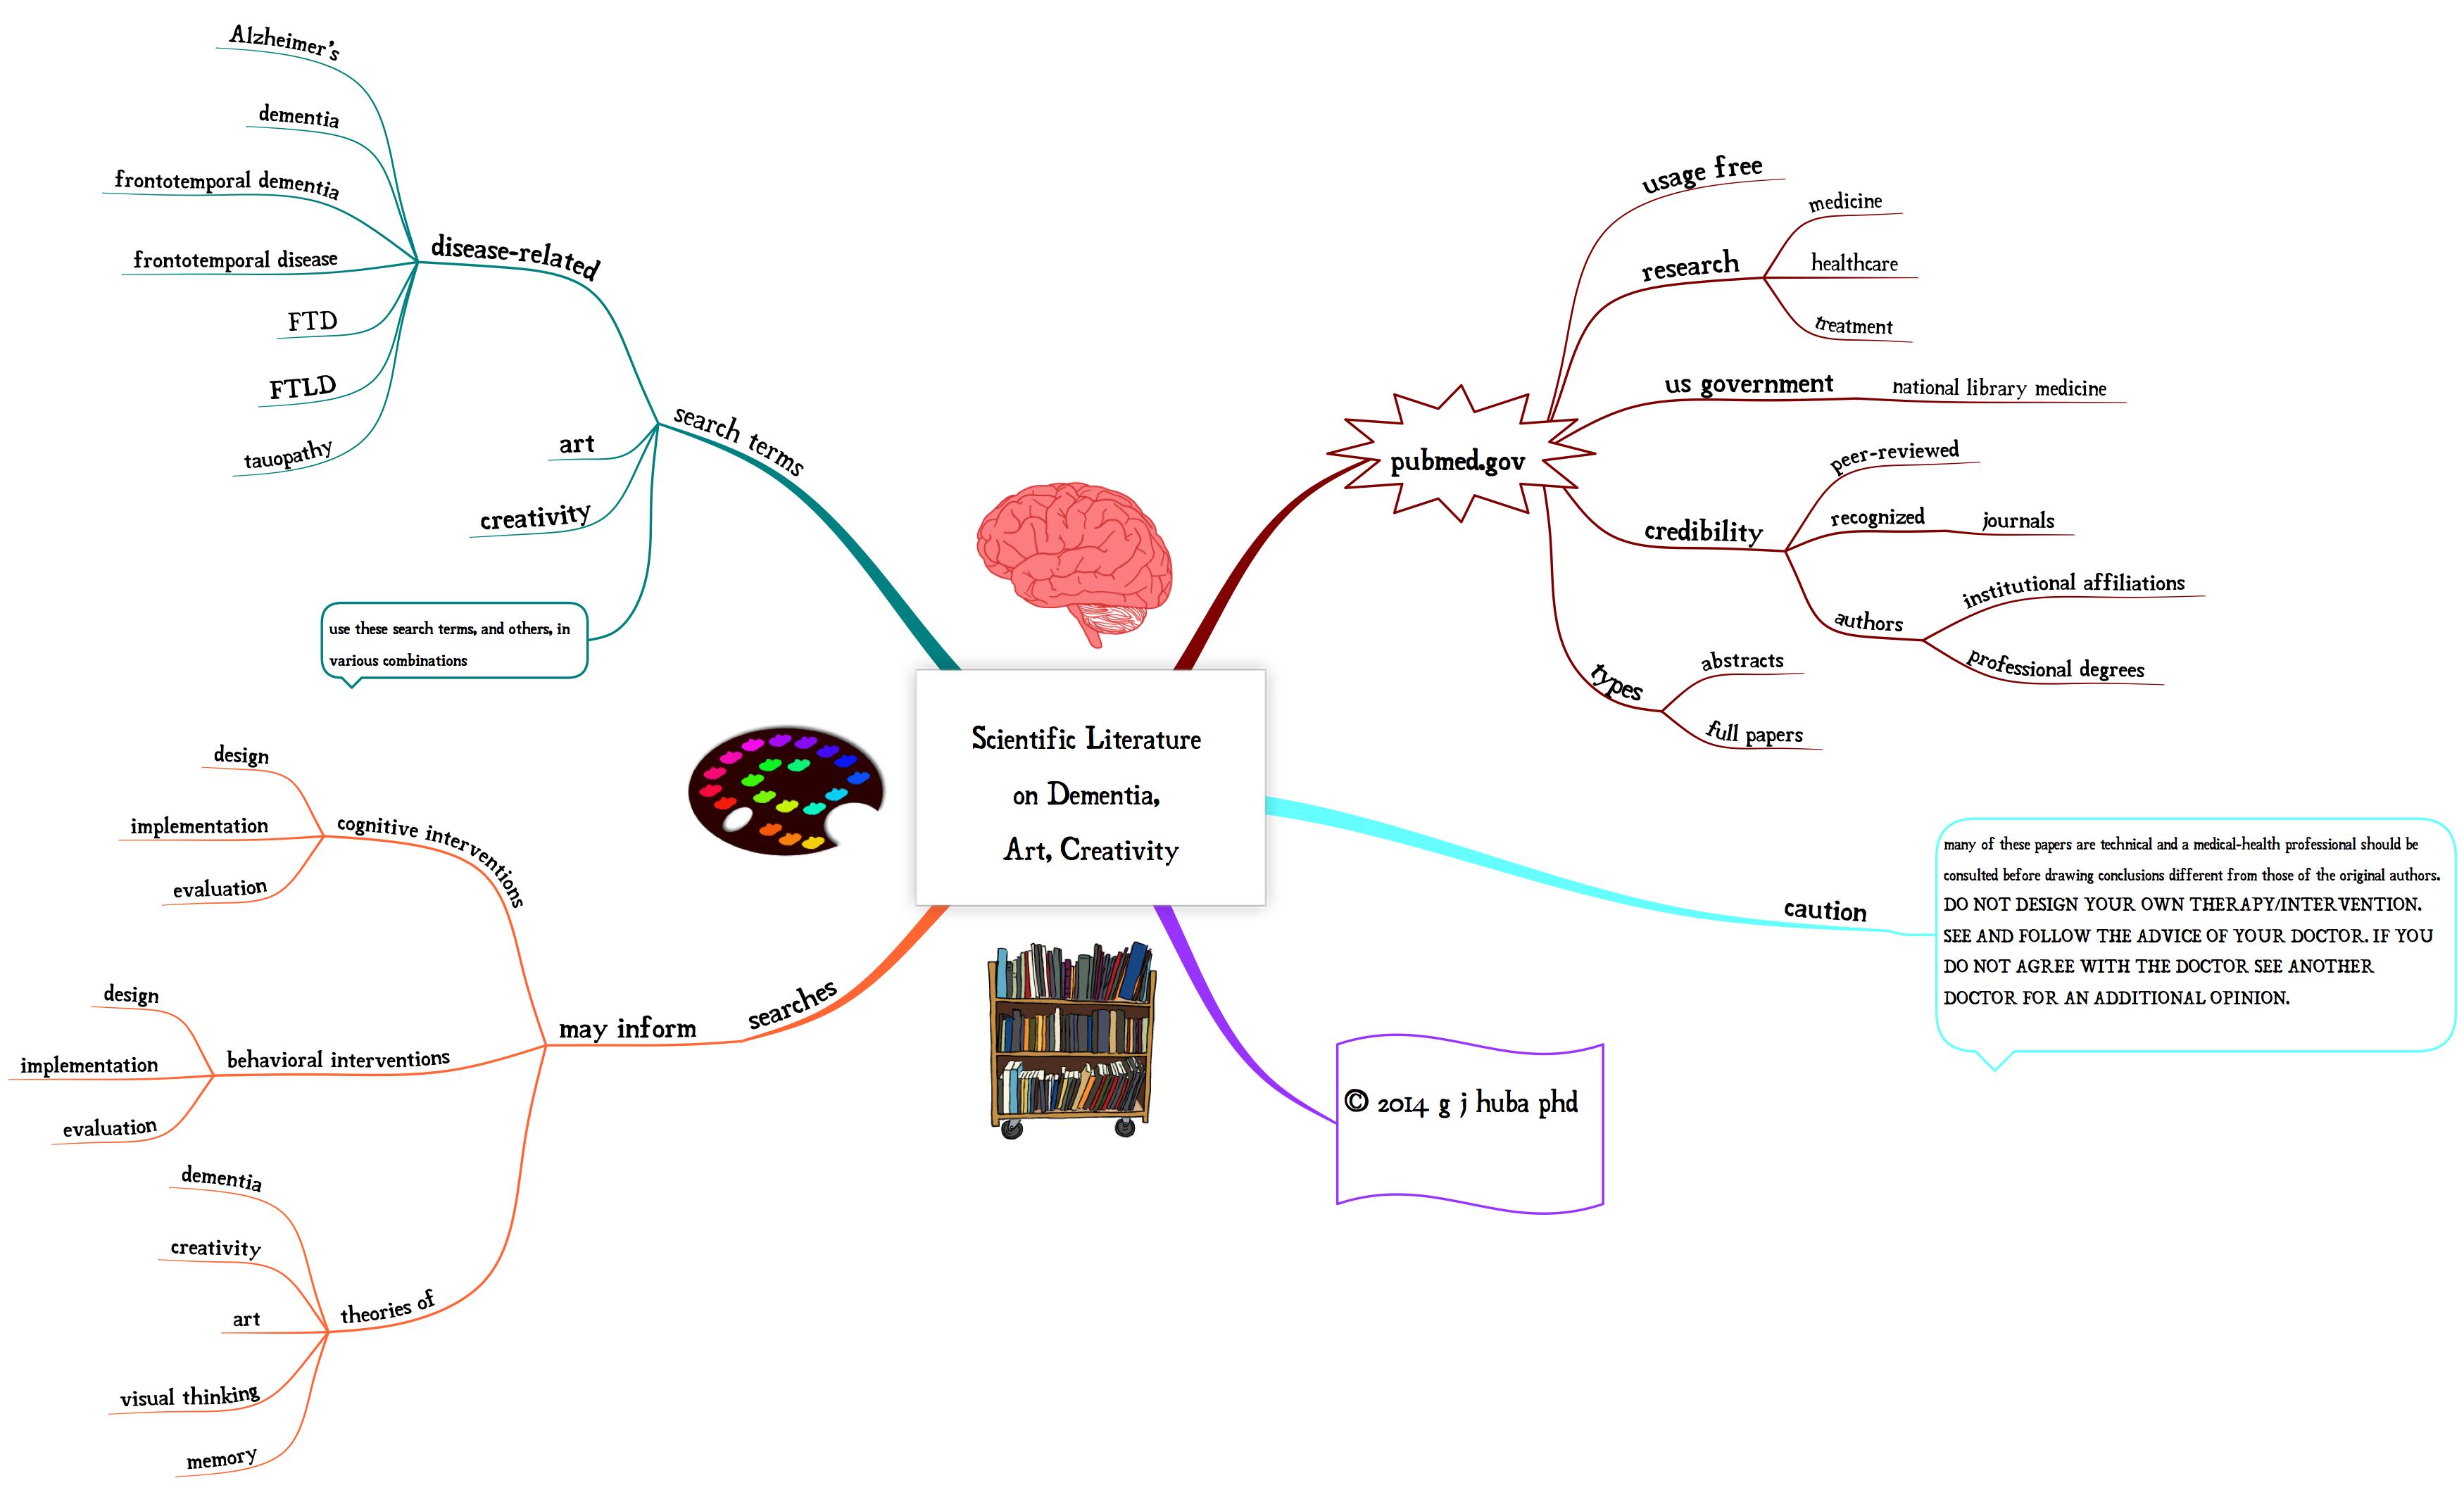 Scientific Literature  on Dementia,  Art, Creativity